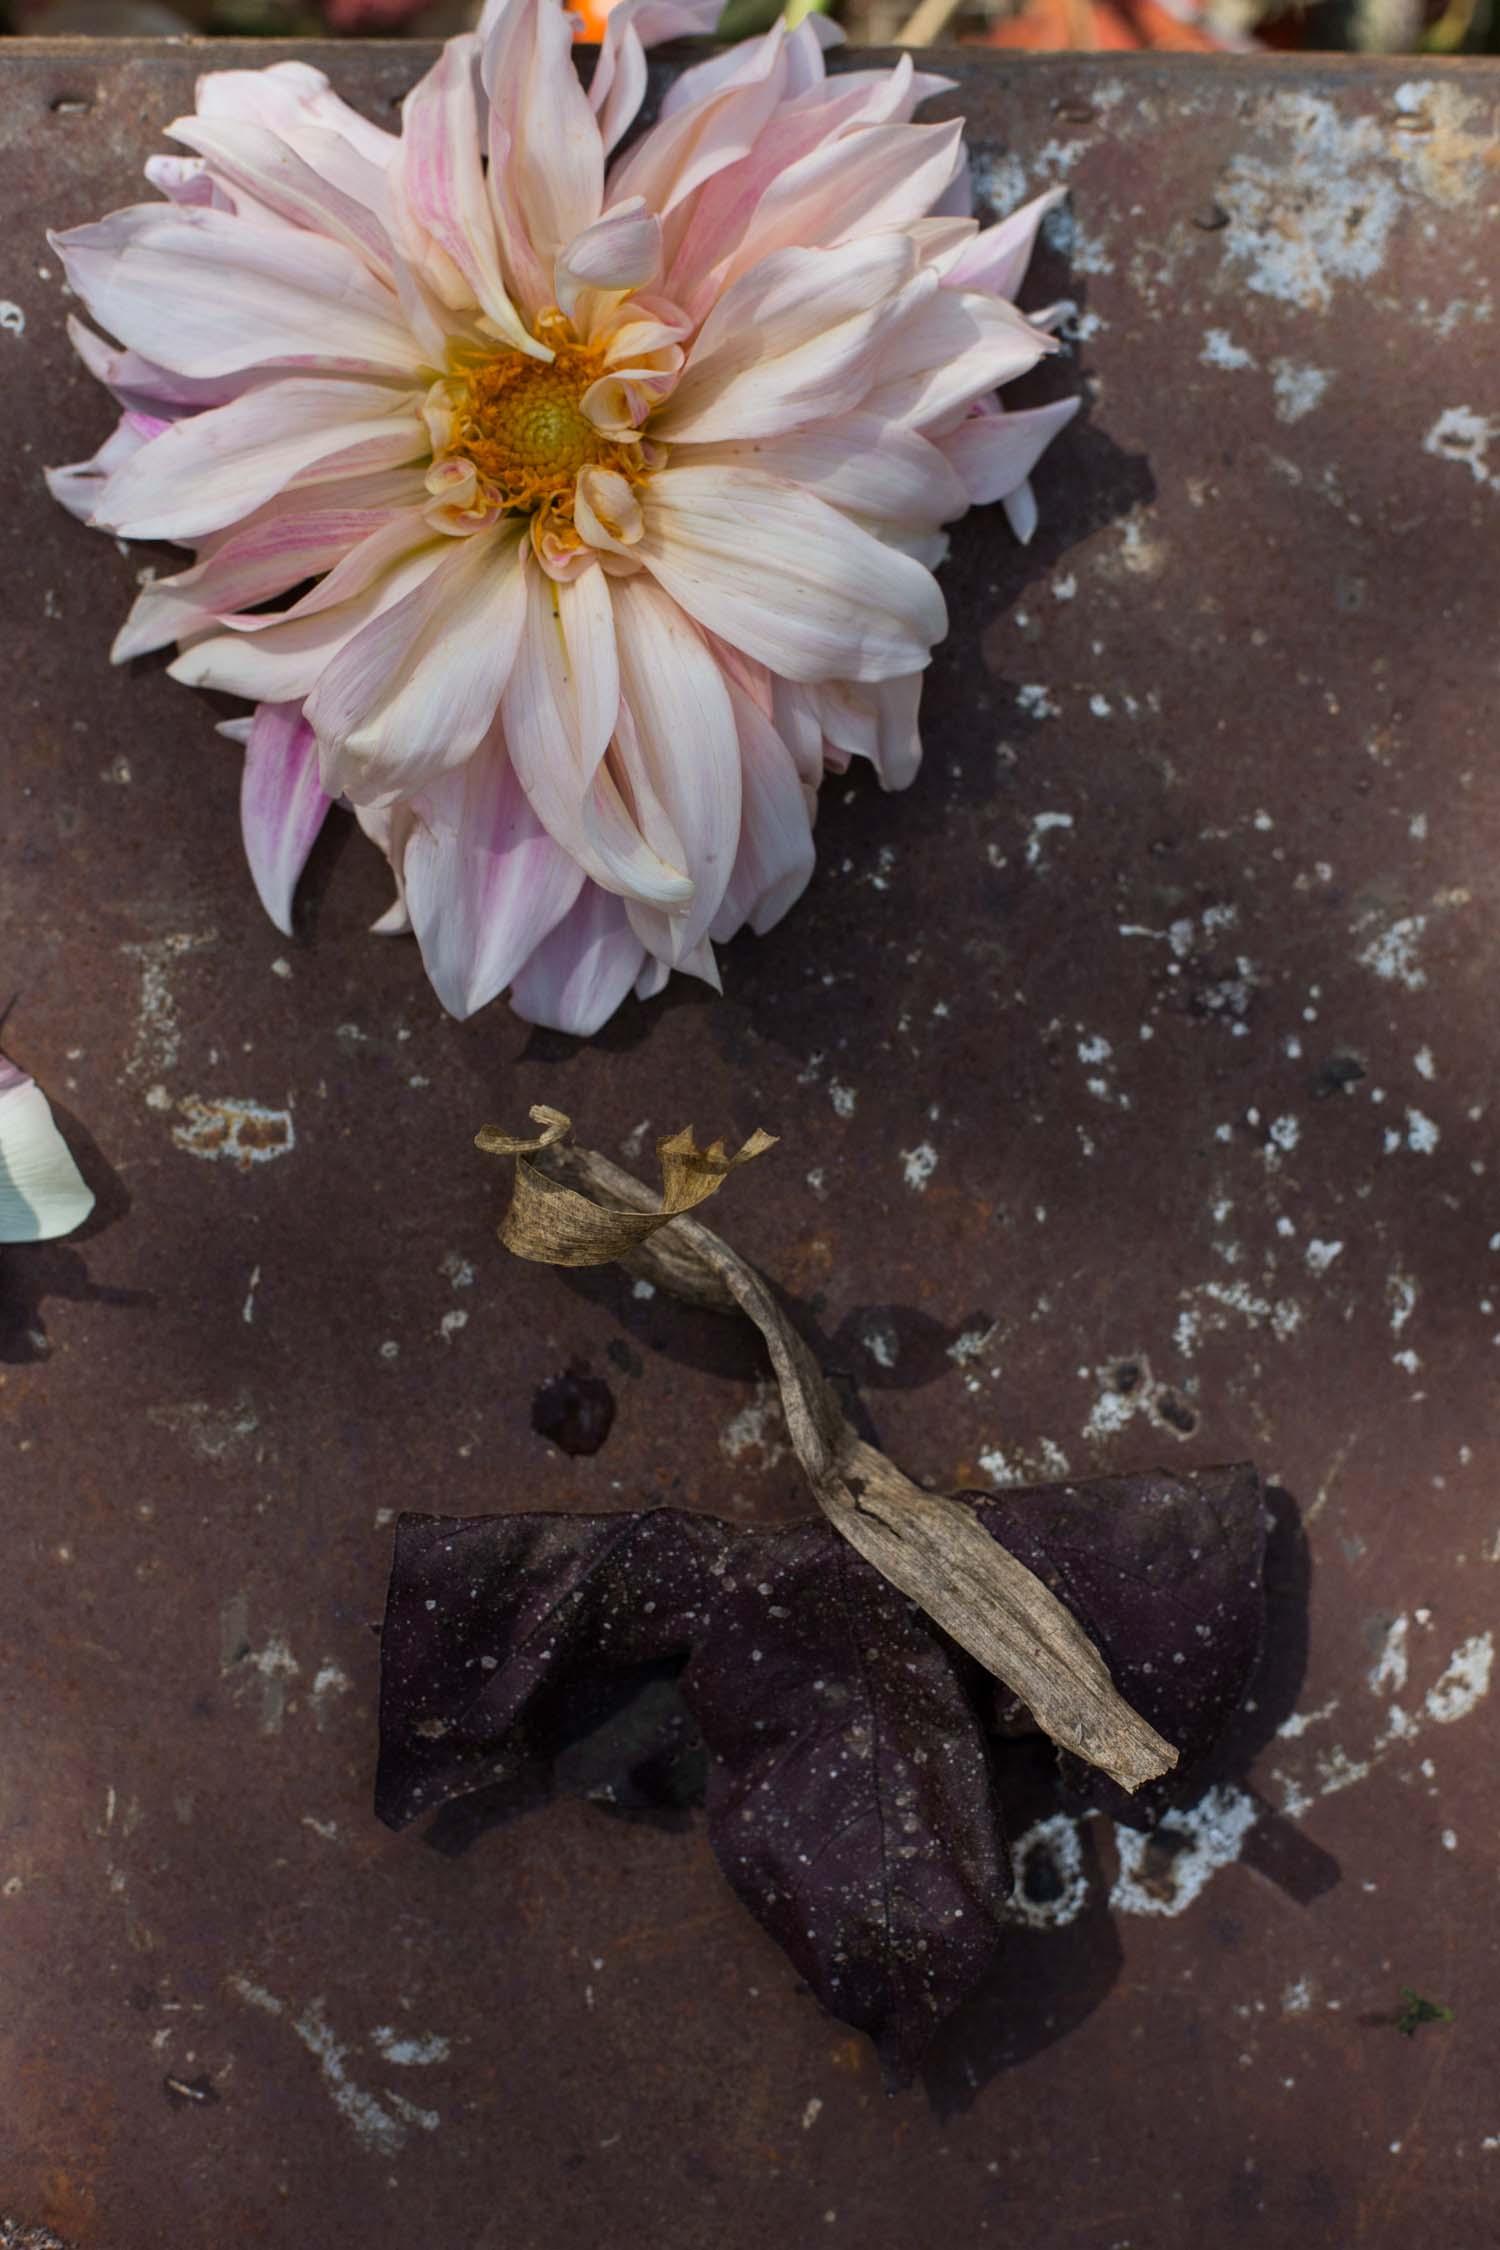 RA_3 porch farm flower social-201610175046.jpg